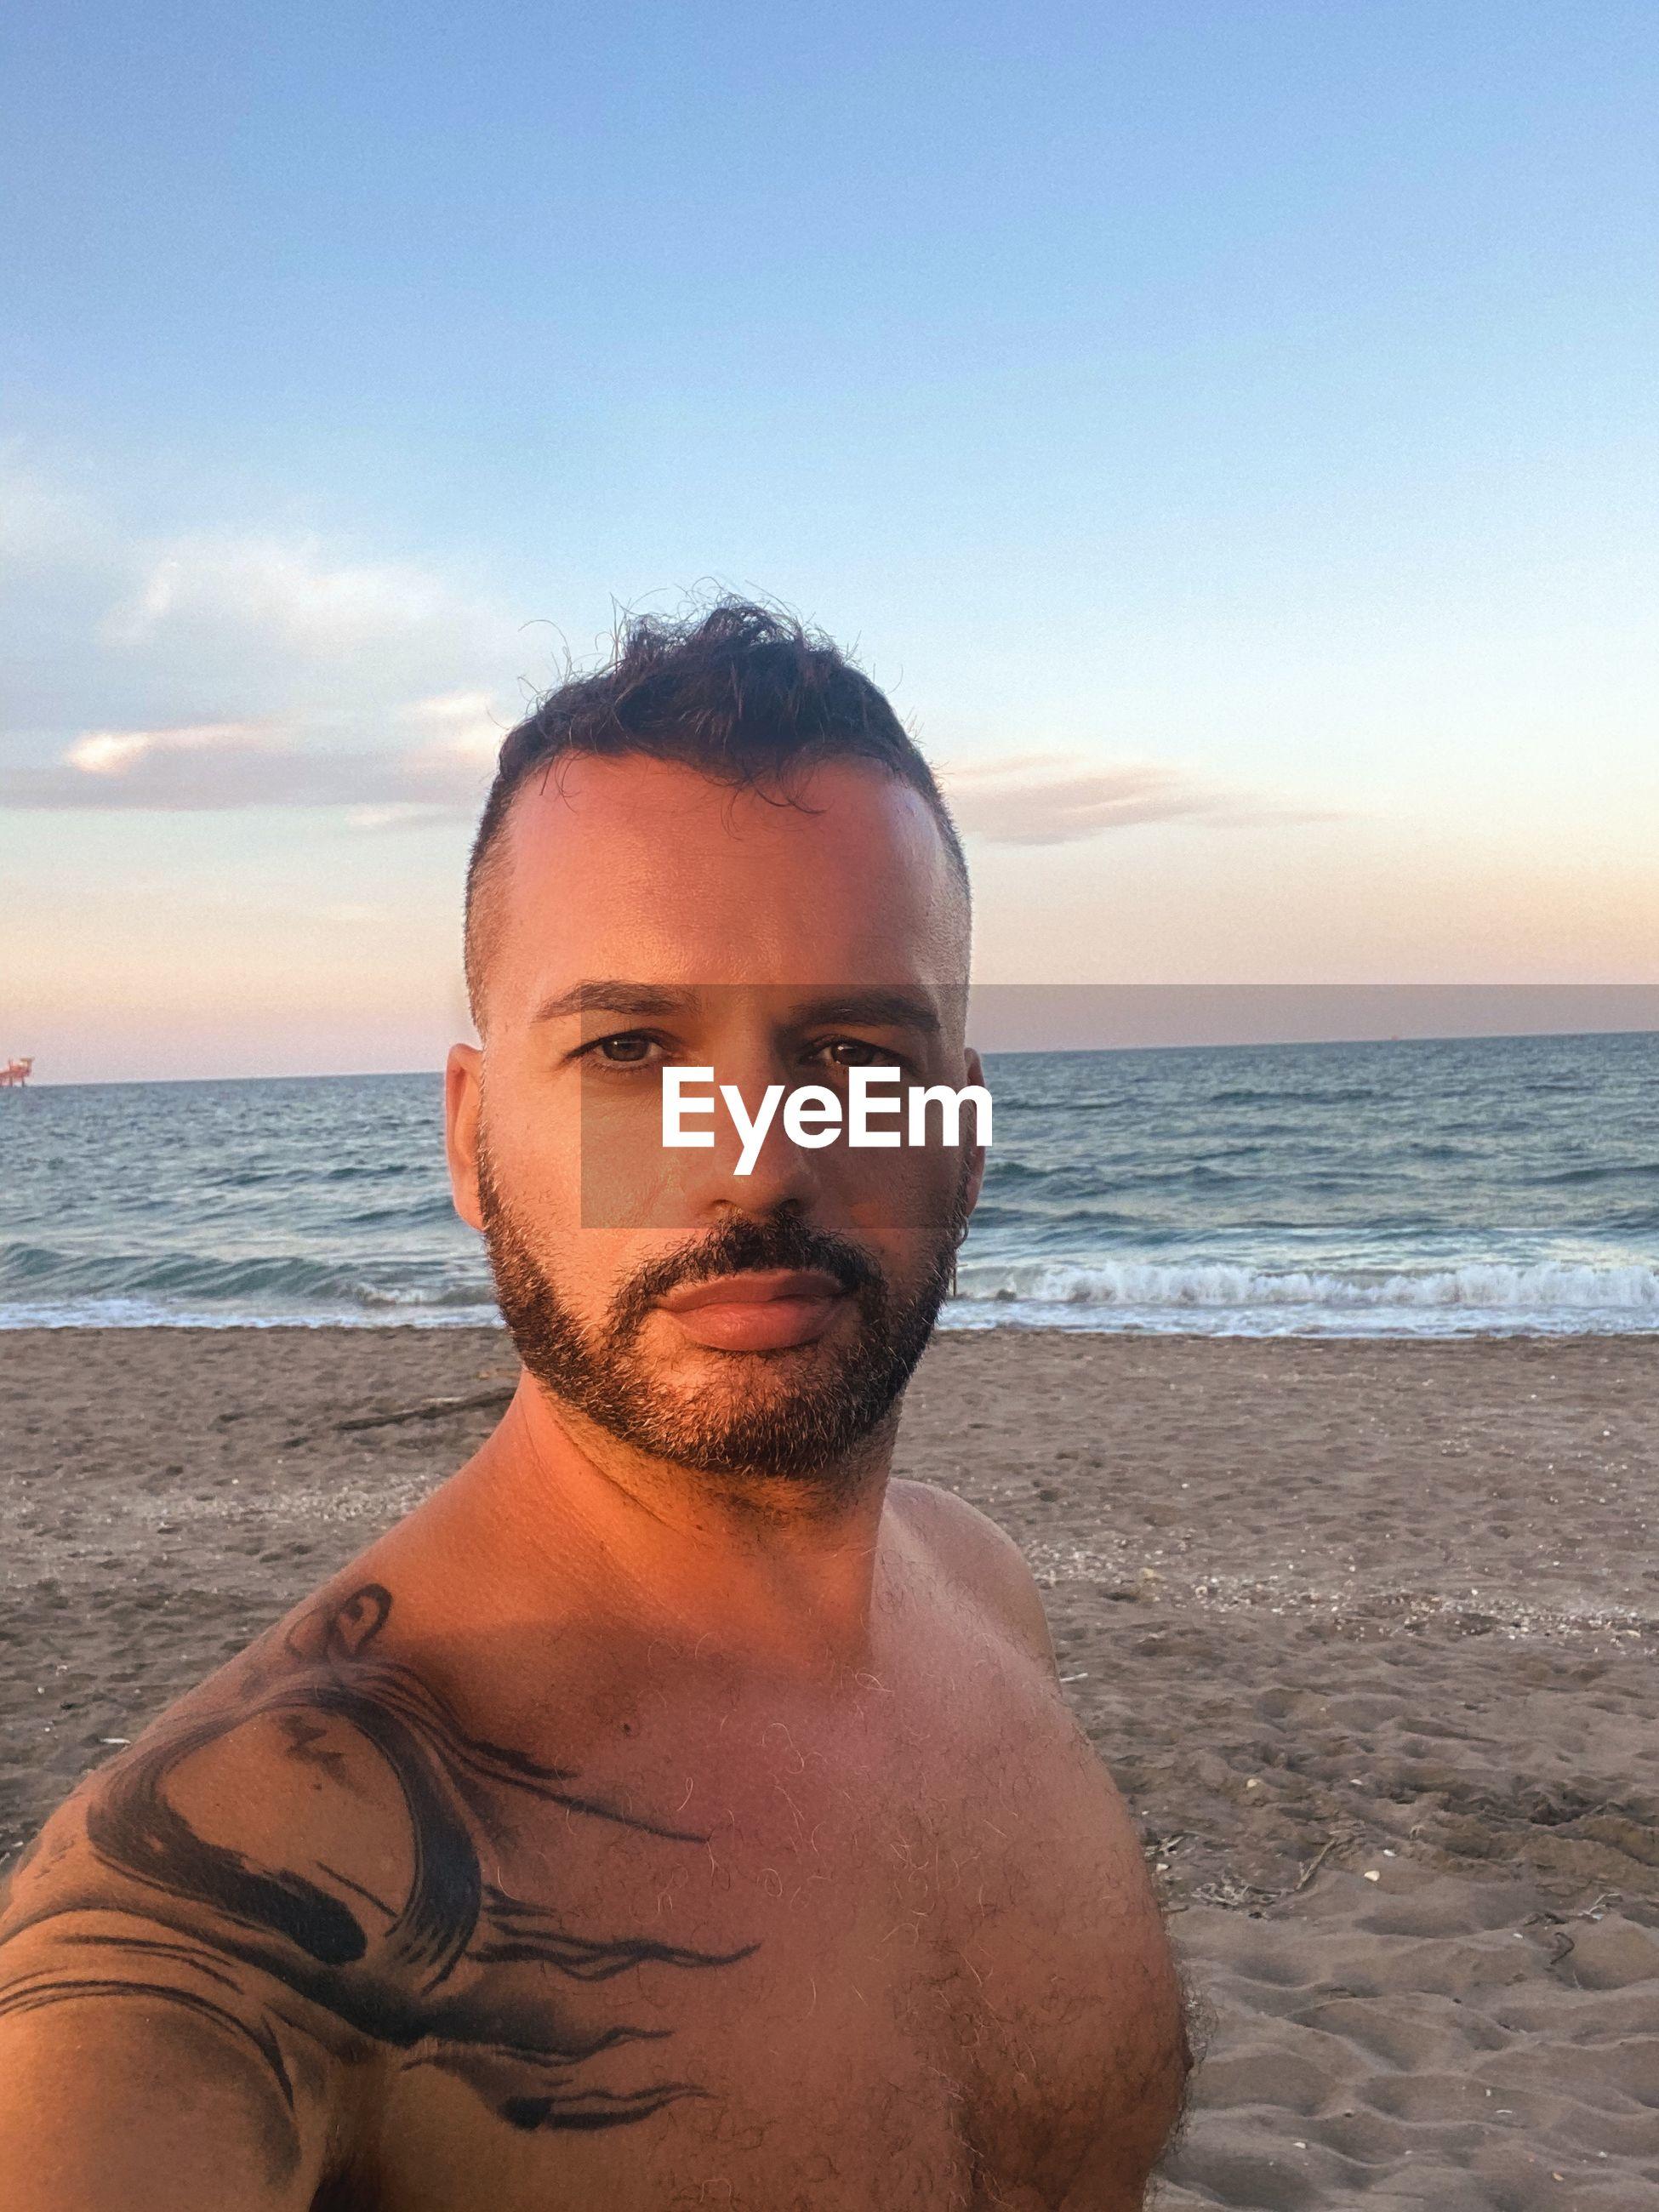 PORTRAIT OF MAN ON BEACH